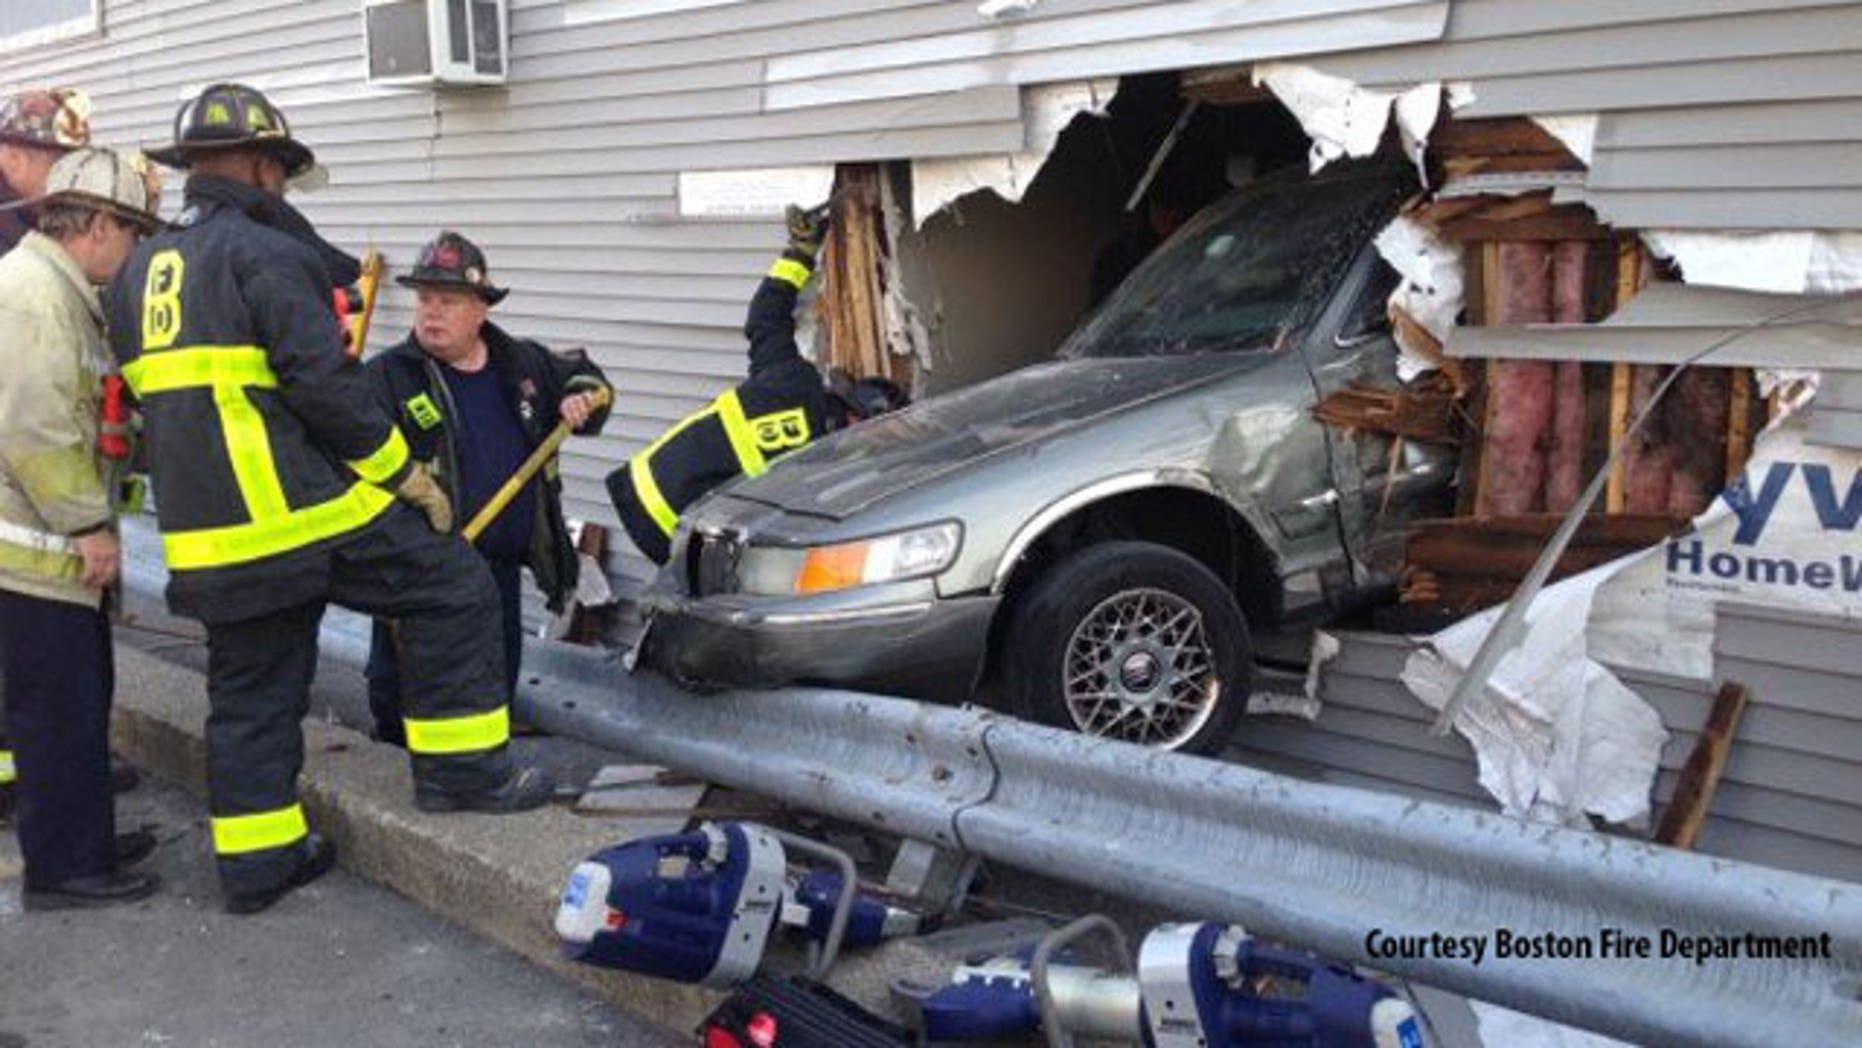 Feb. 1, 2014: This photo shows a car that crashed through a Rite Aid store in South Boston.